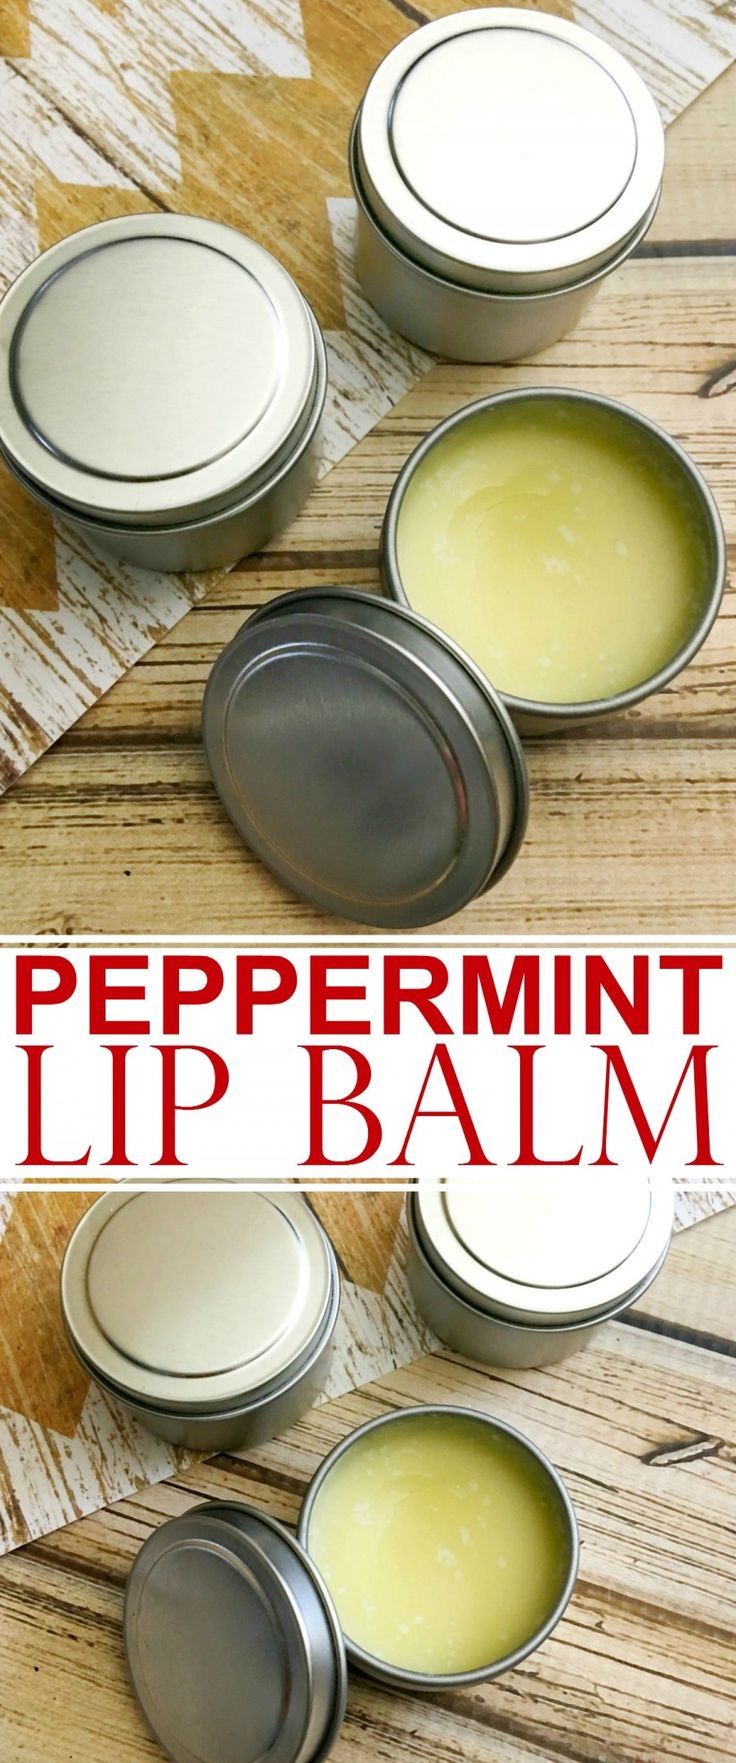 2751 Best Beauty Images On Pinterest Secrets Tips Mps Whitehoney Diy Peppermint Lip Balm